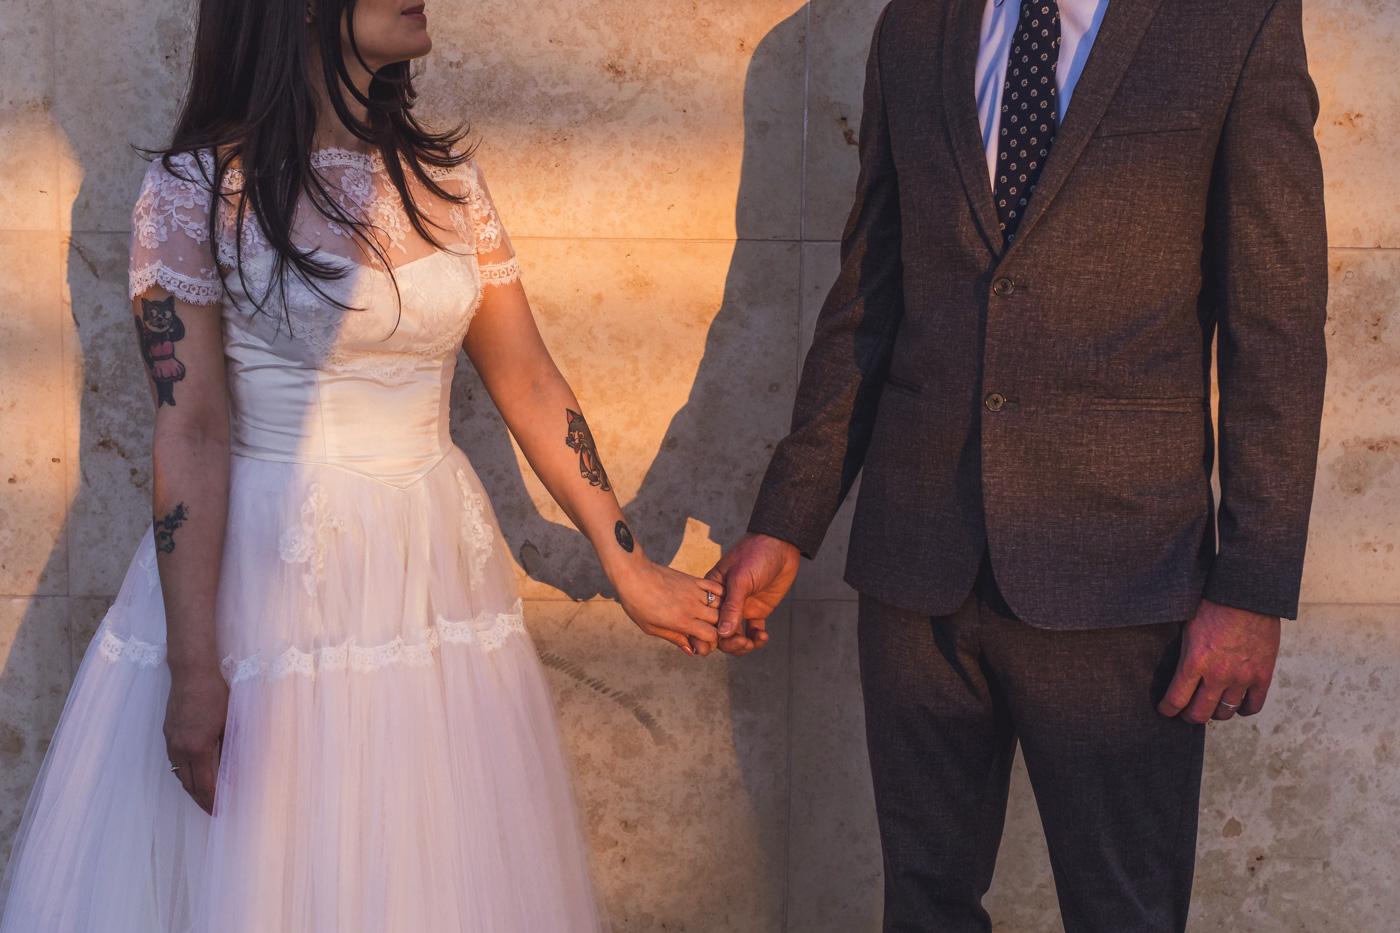 aaron-kes-photography-romantic-wedding-photo